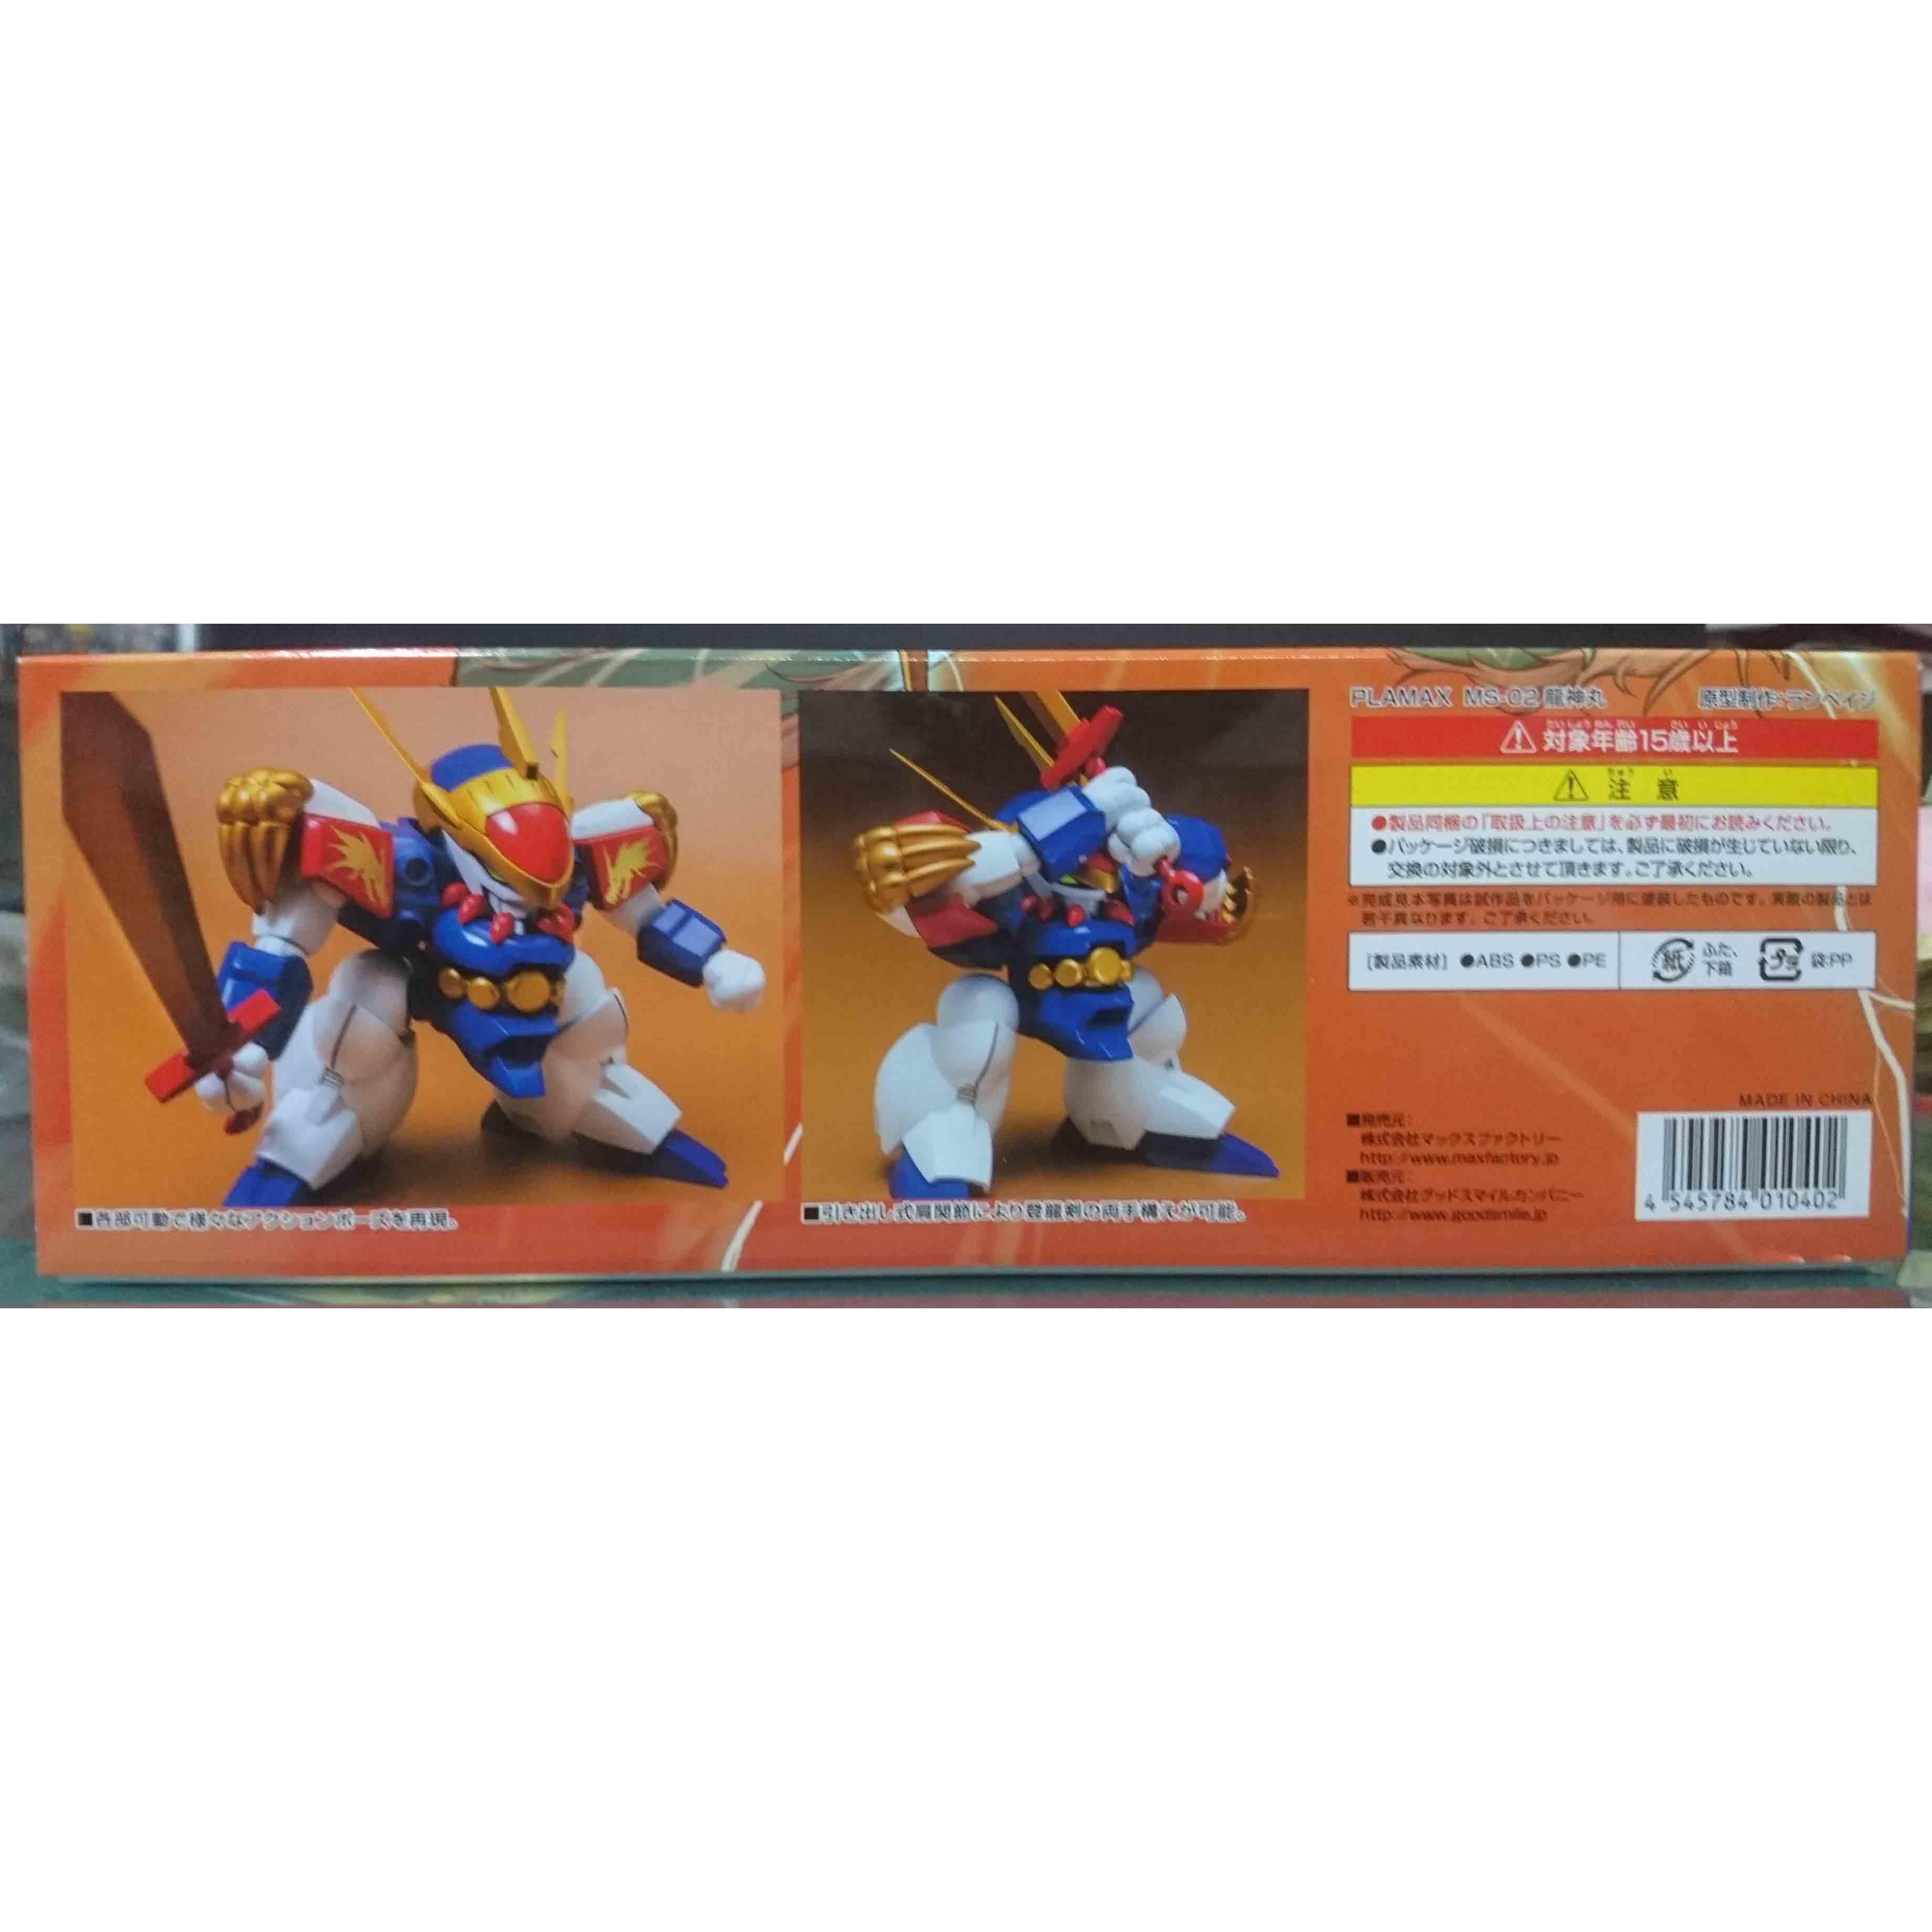 PLAMAX MS-02 龍神丸 組裝模型,益祥模型玩具 外盒實際拍攝照片。